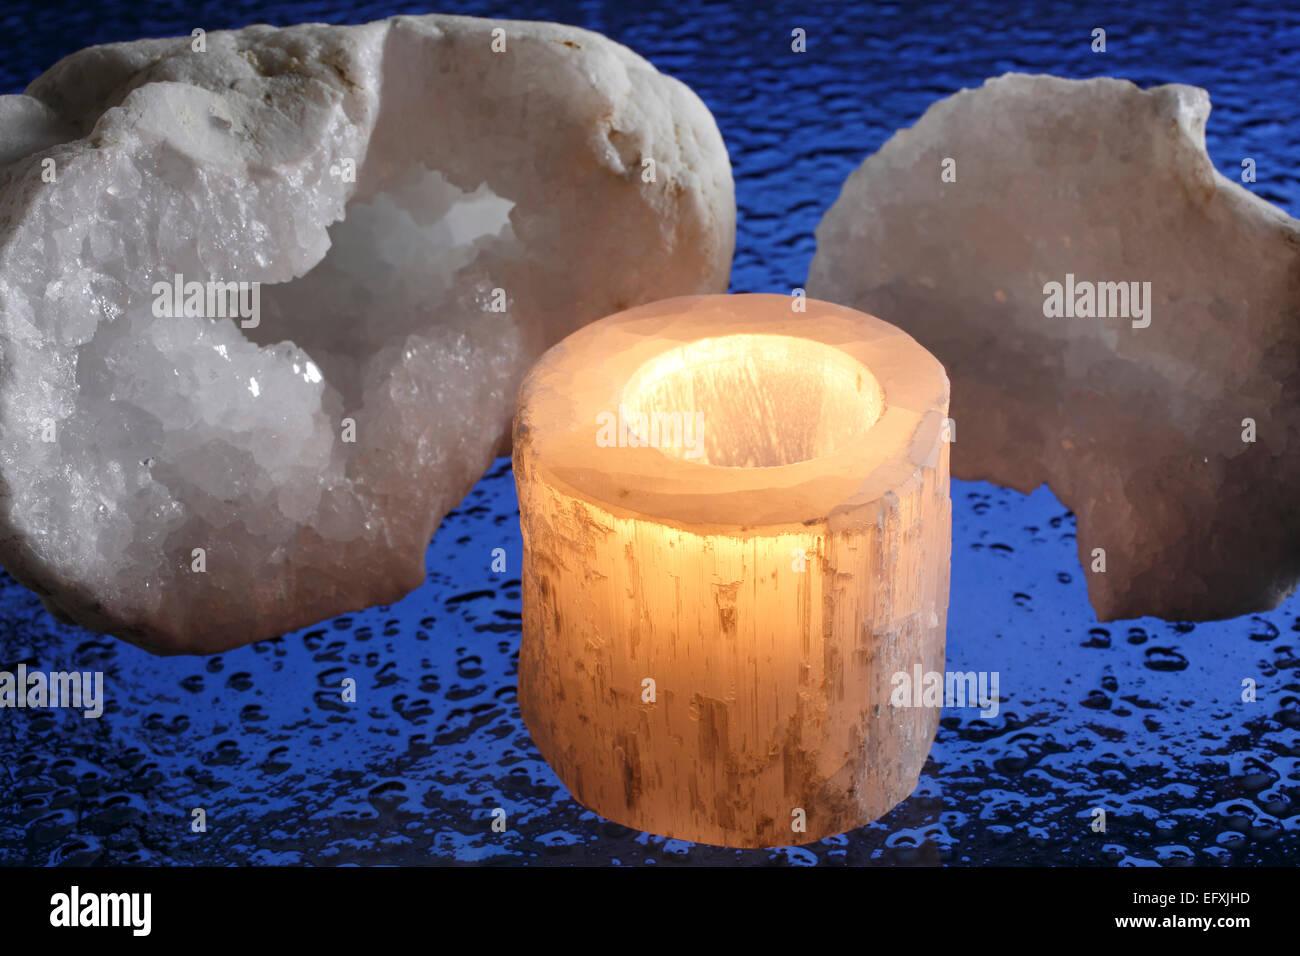 rock crystal,candlestick of selenite - Stock Image